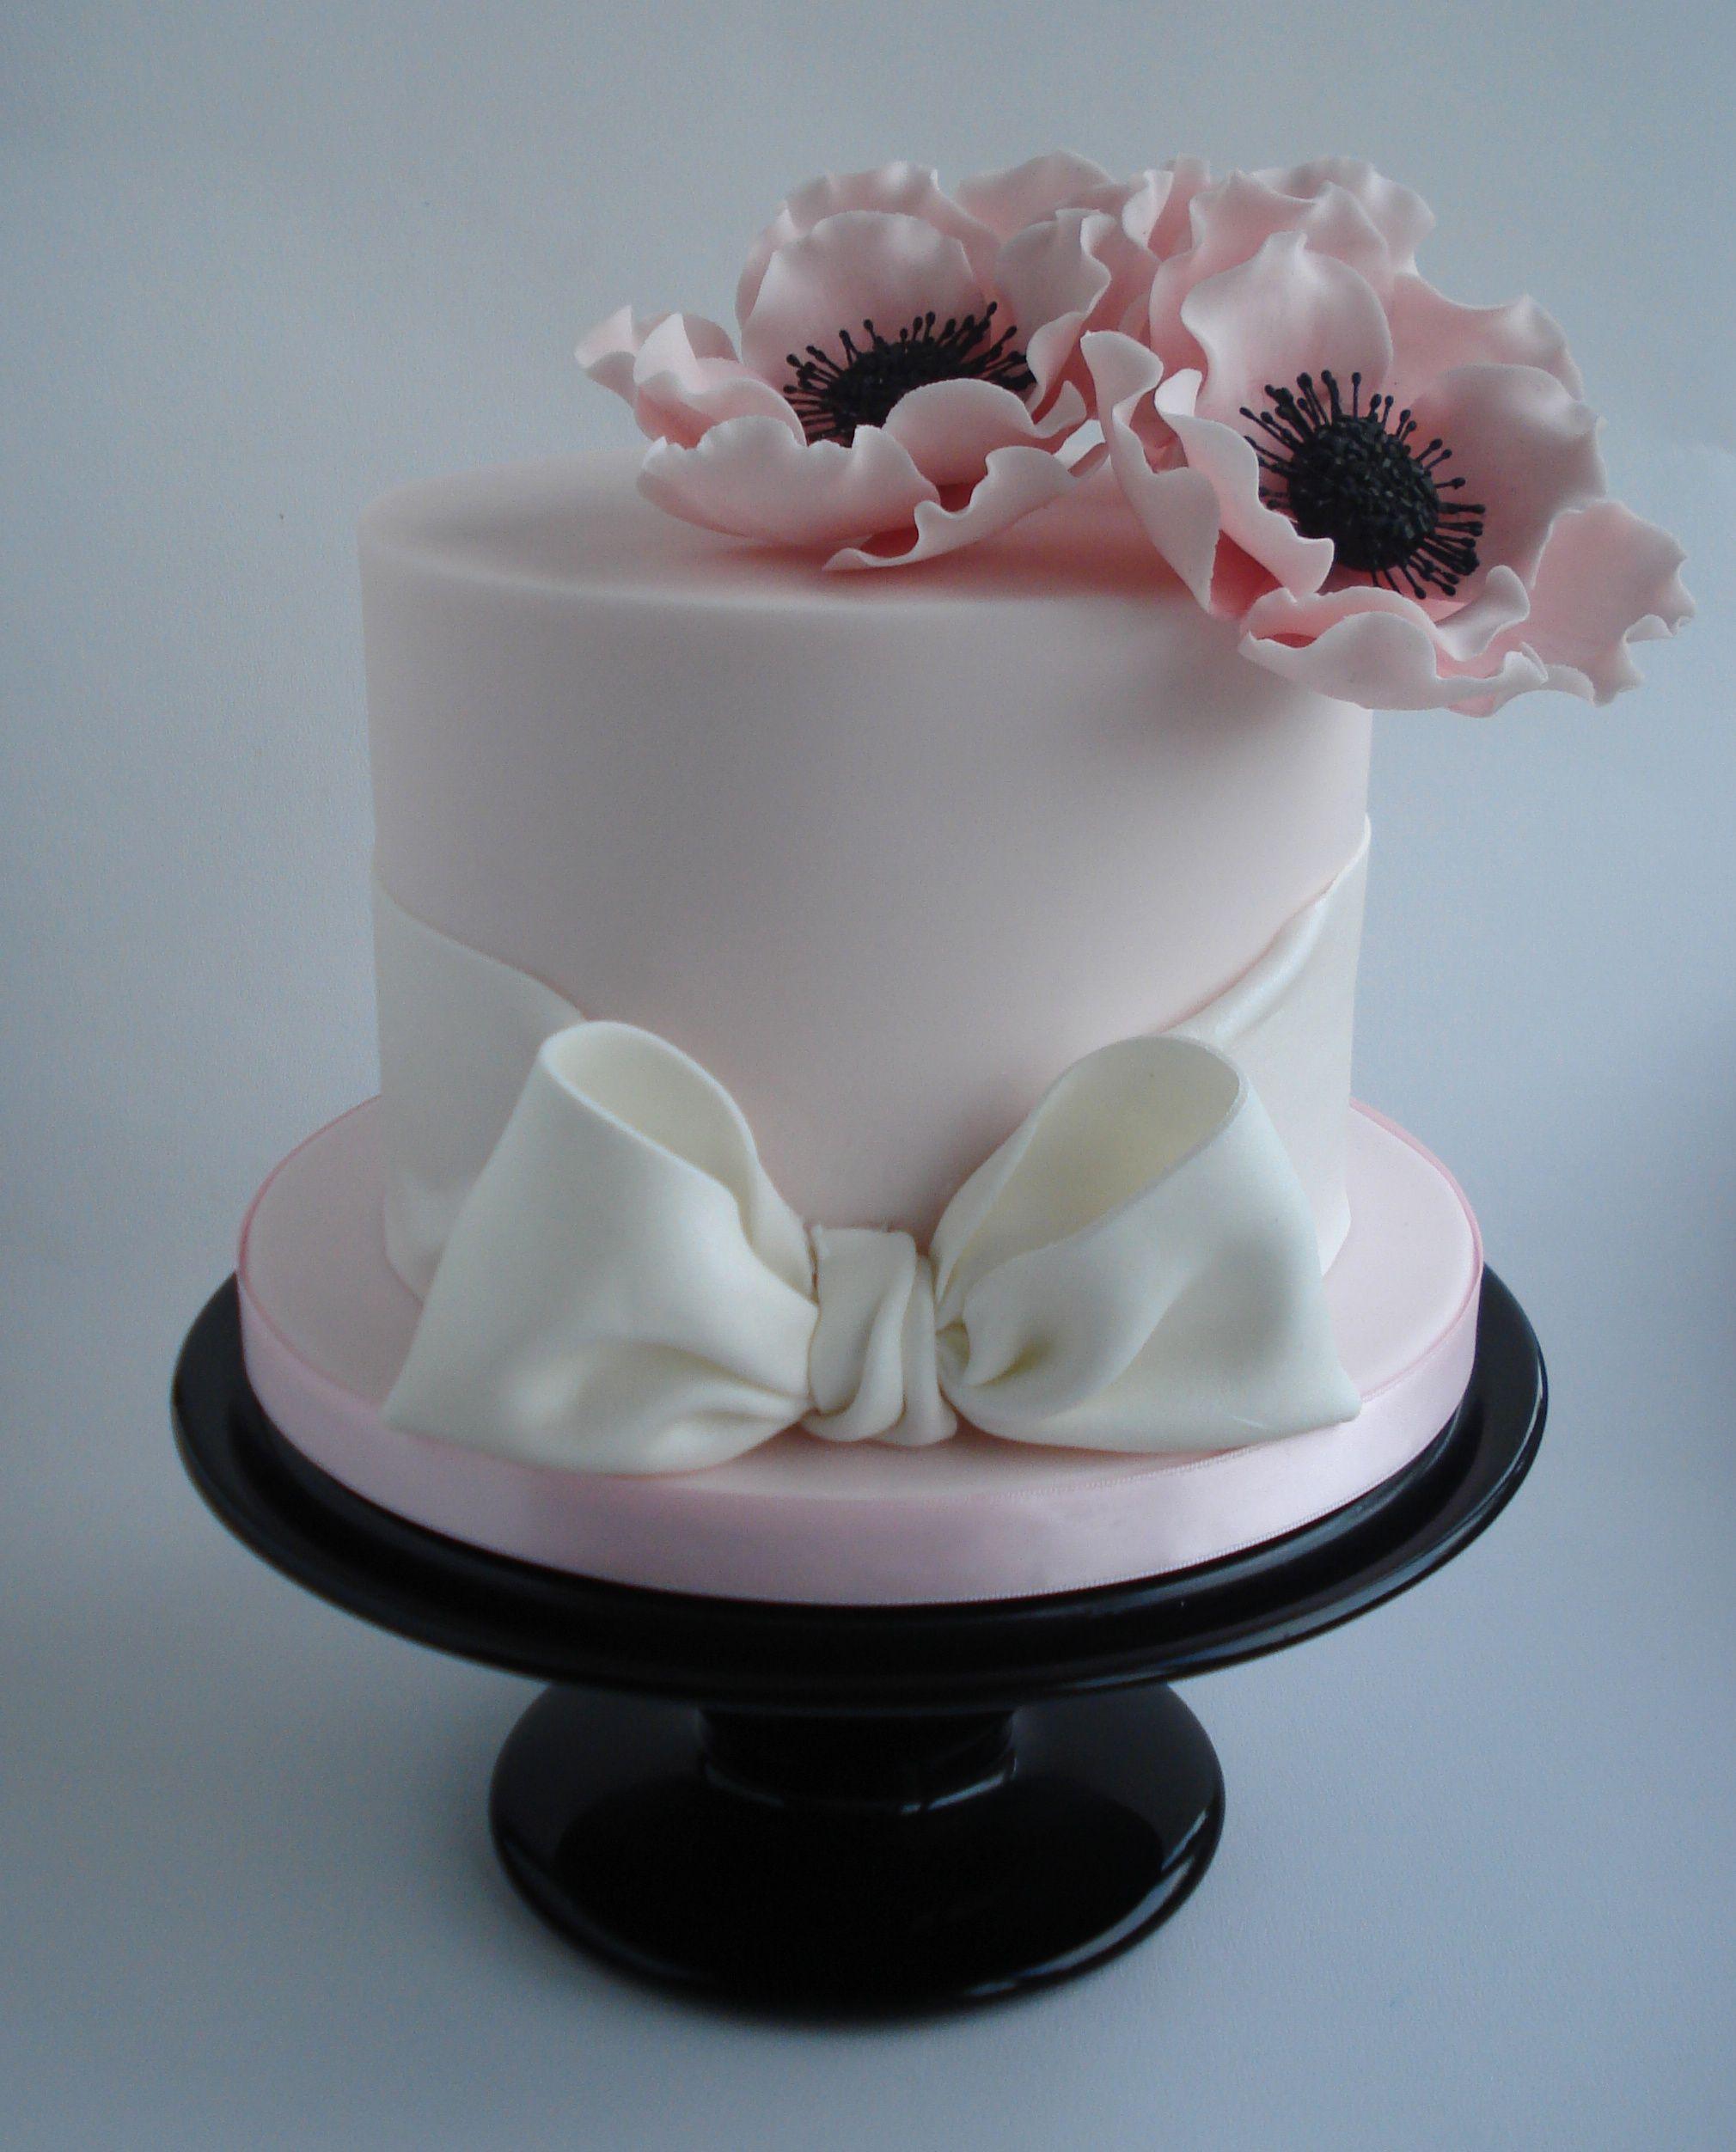 Birthday Cakes pretty anemone flower cake x Elegant Cakes